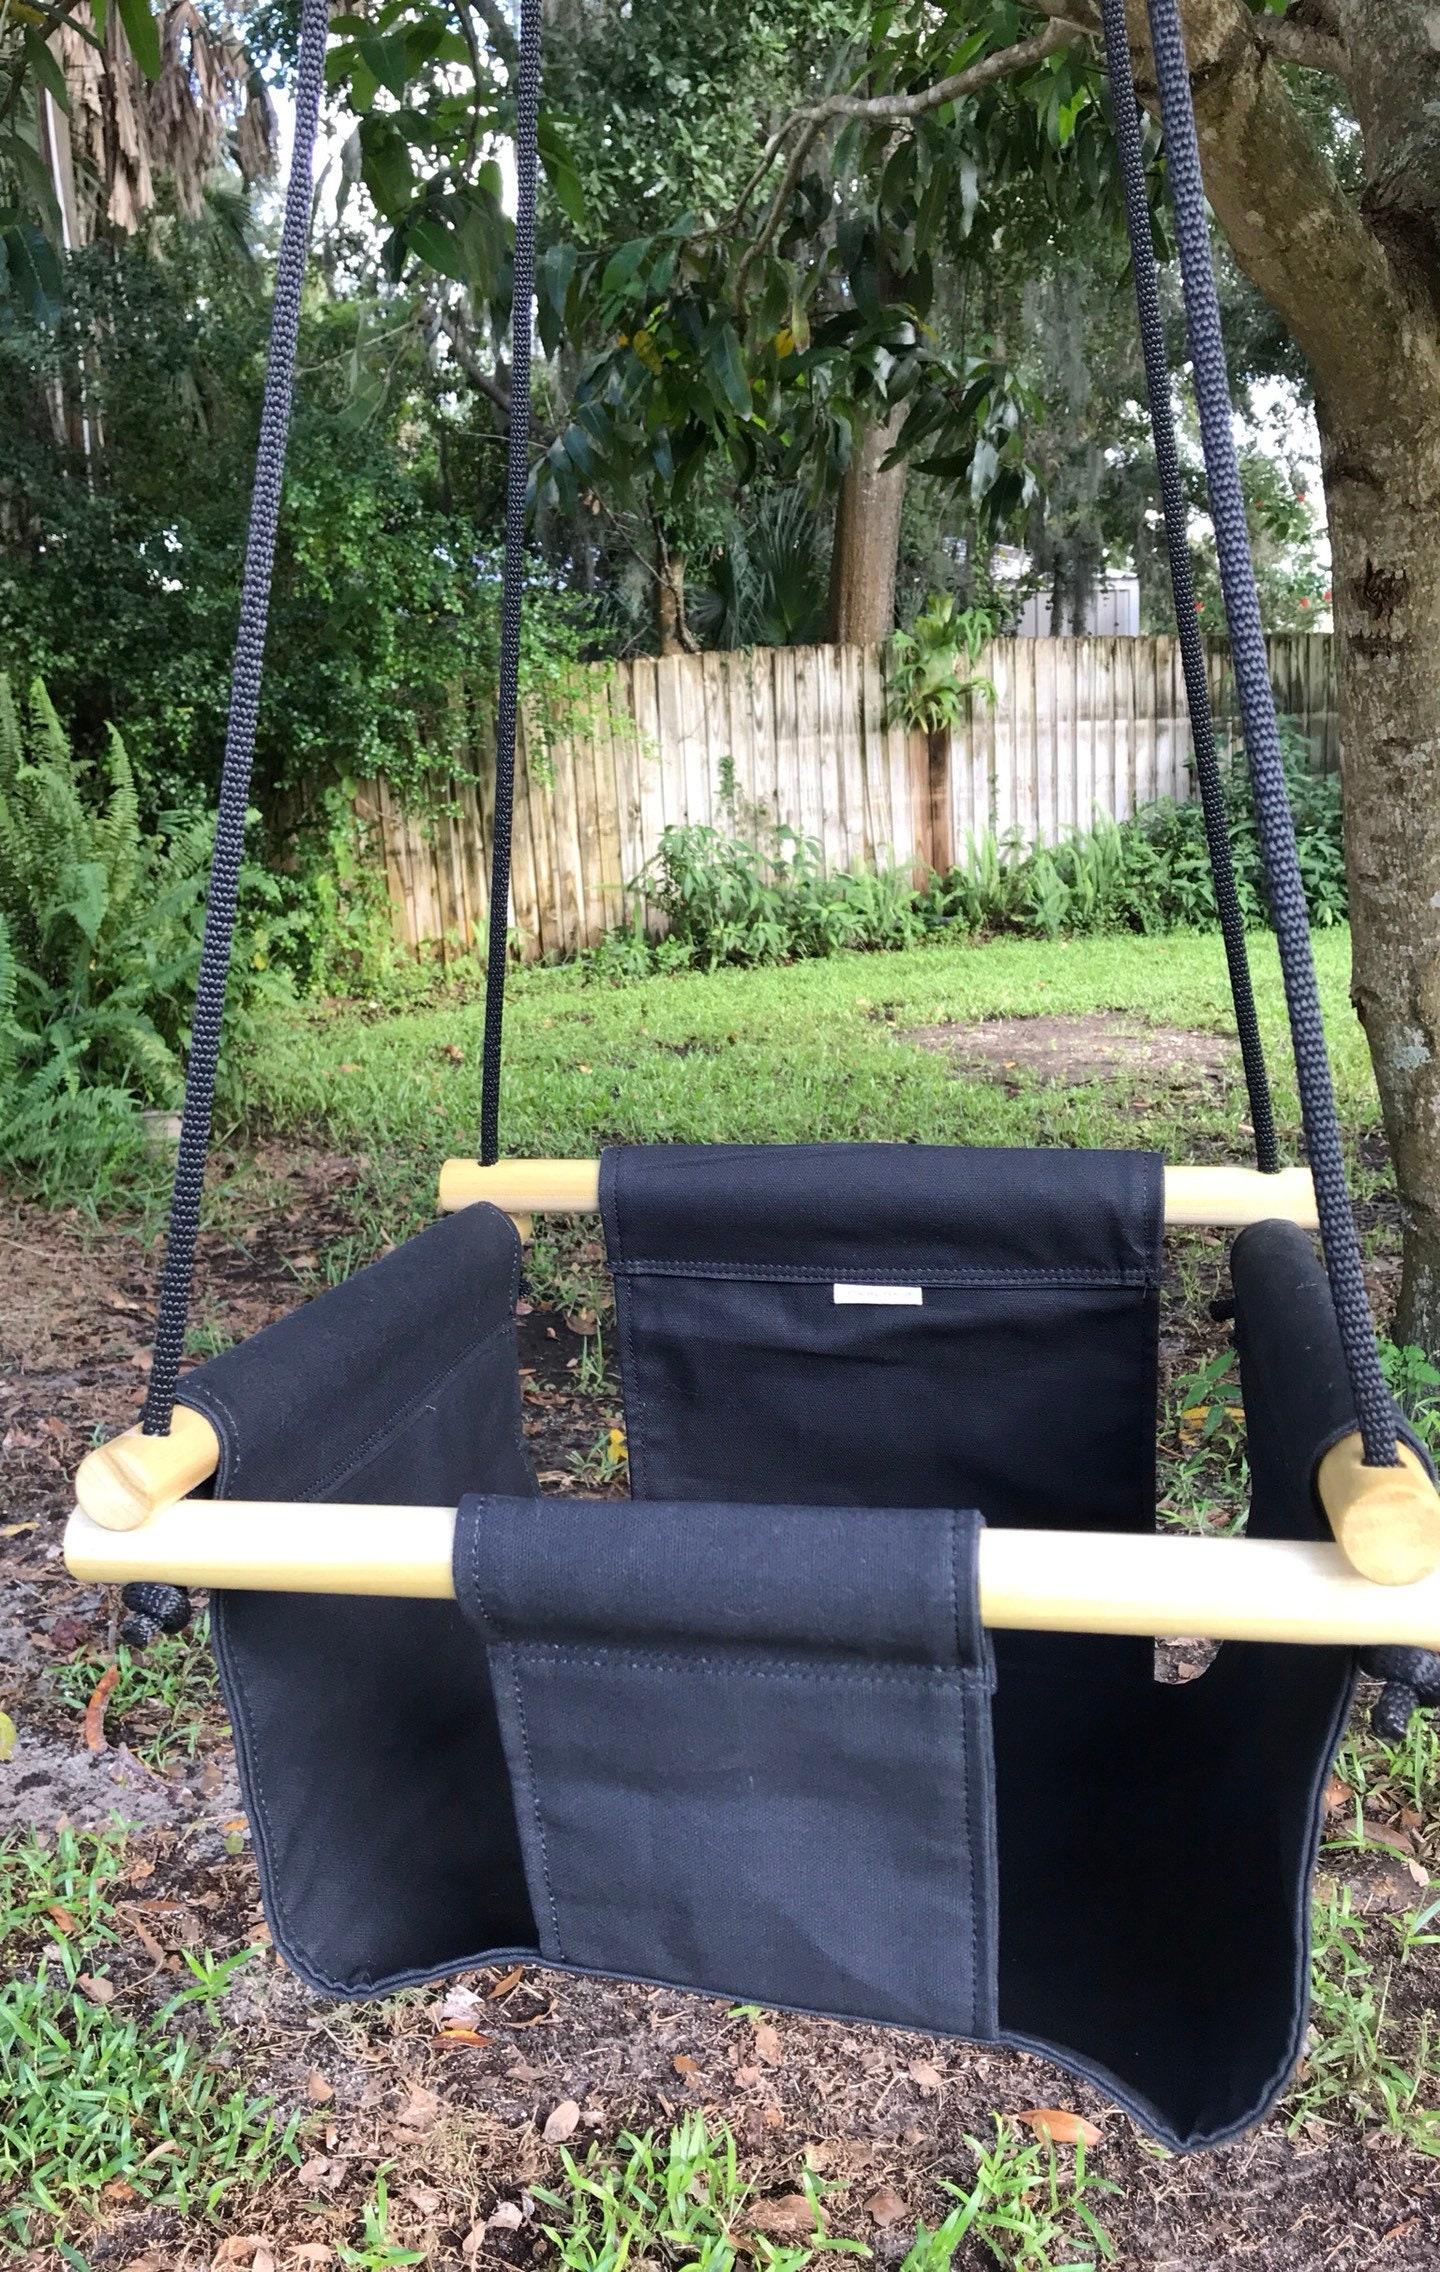 Baby Swing Black Toddler Outdoor Nursery Decor